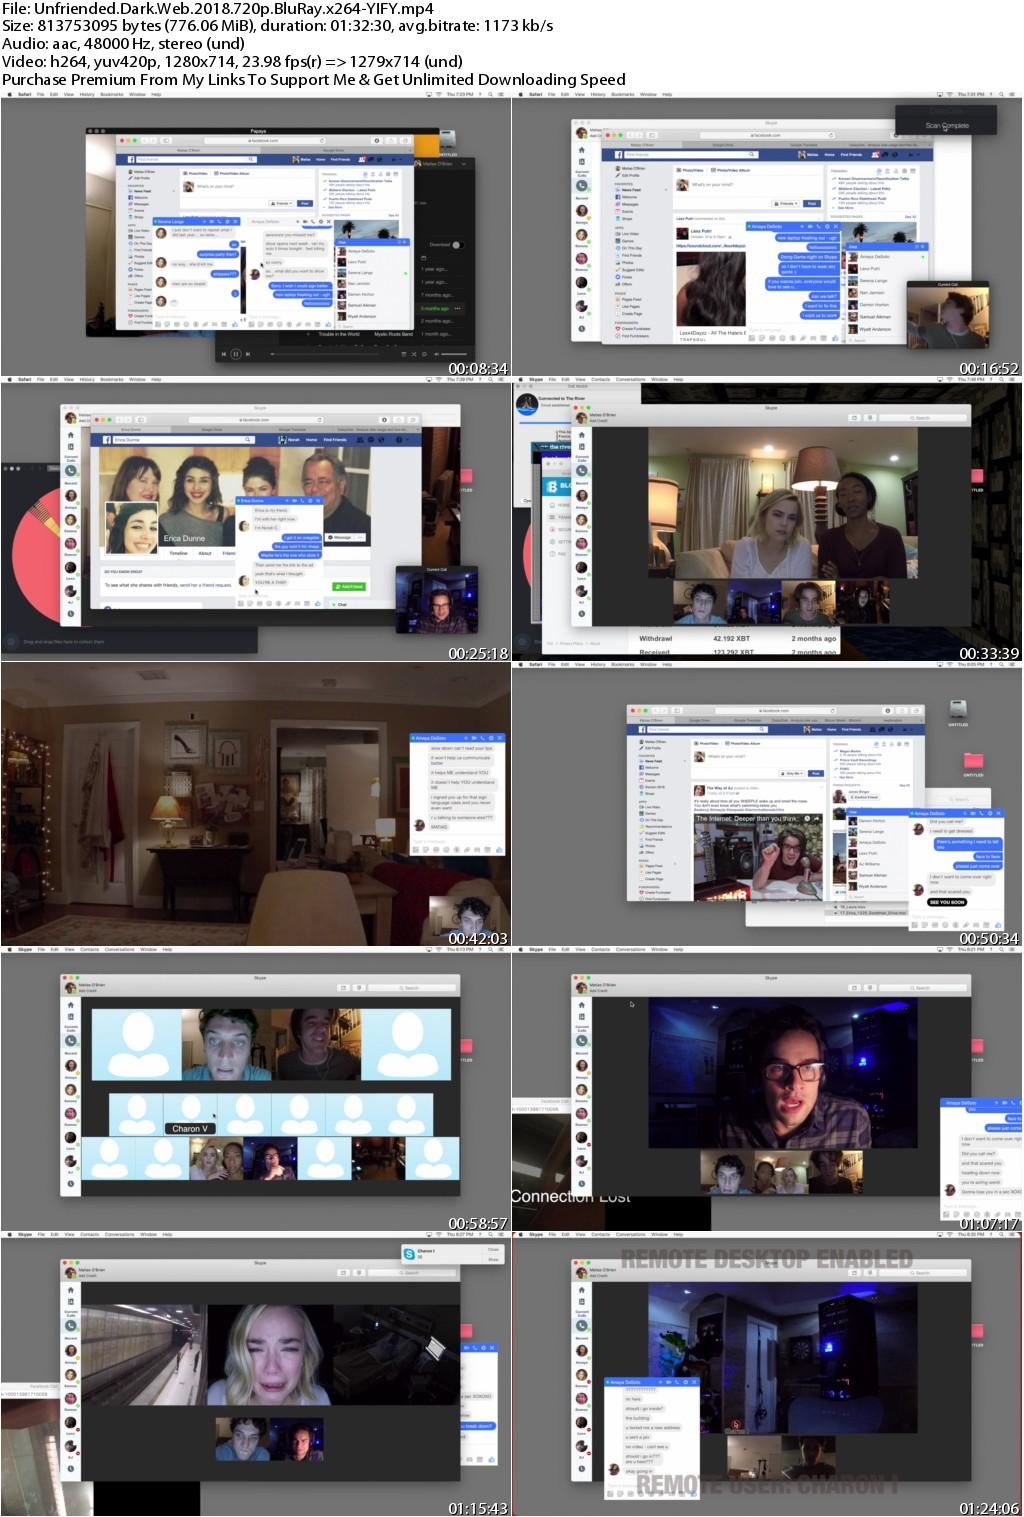 Unfriended Dark Web (2018) 720p BluRay x264-YIFY